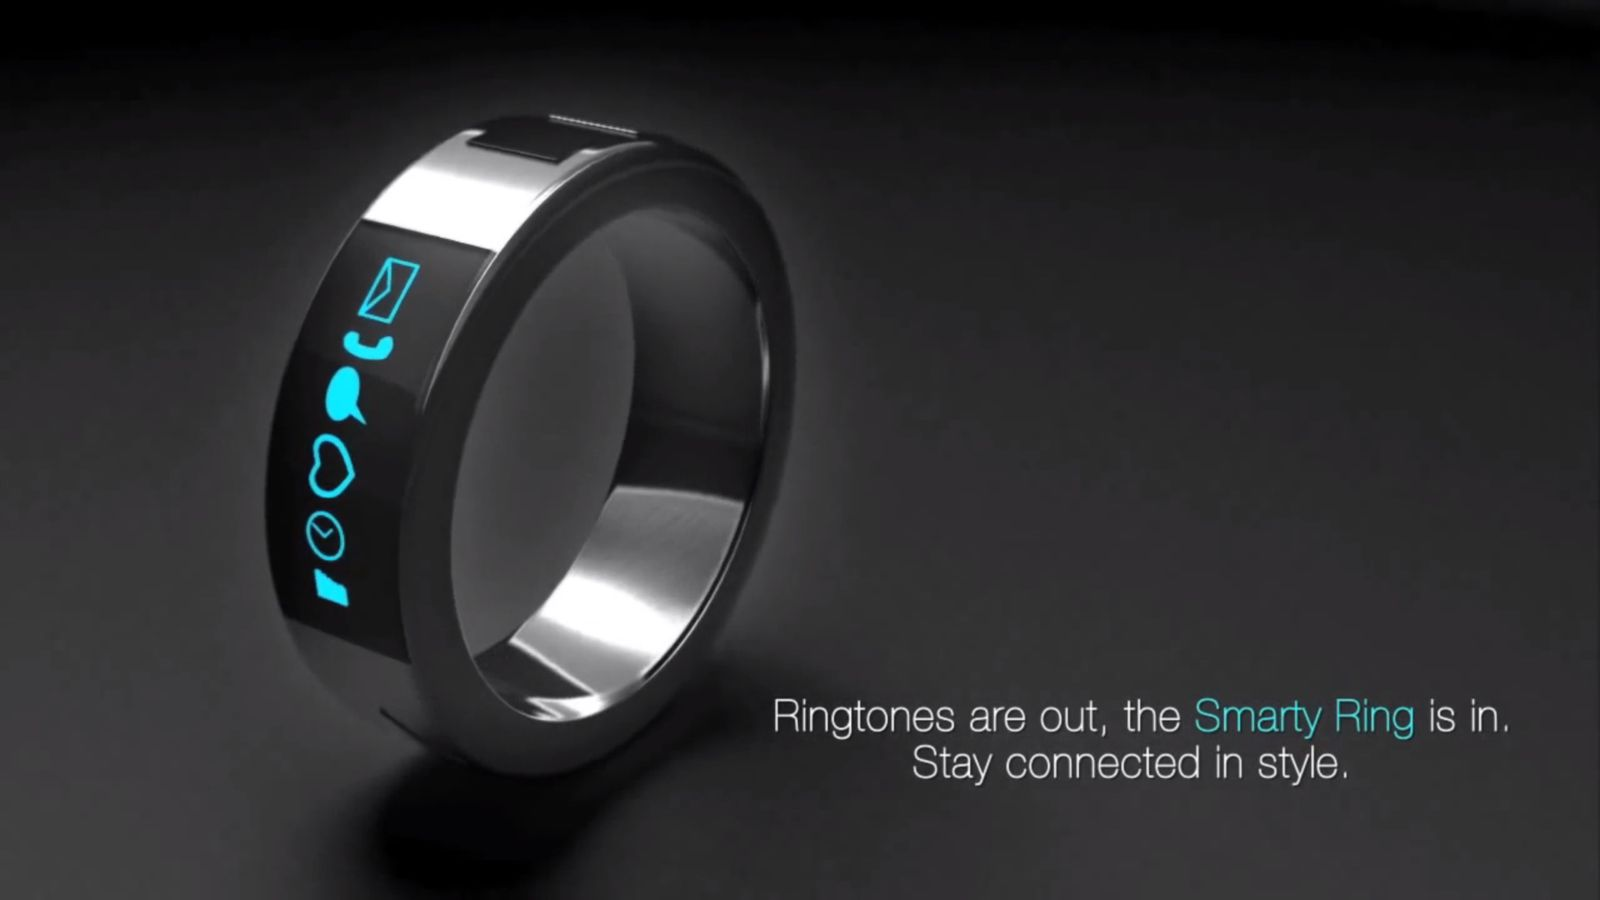 NUR ALS ZITAT Screenshot Smart Ring